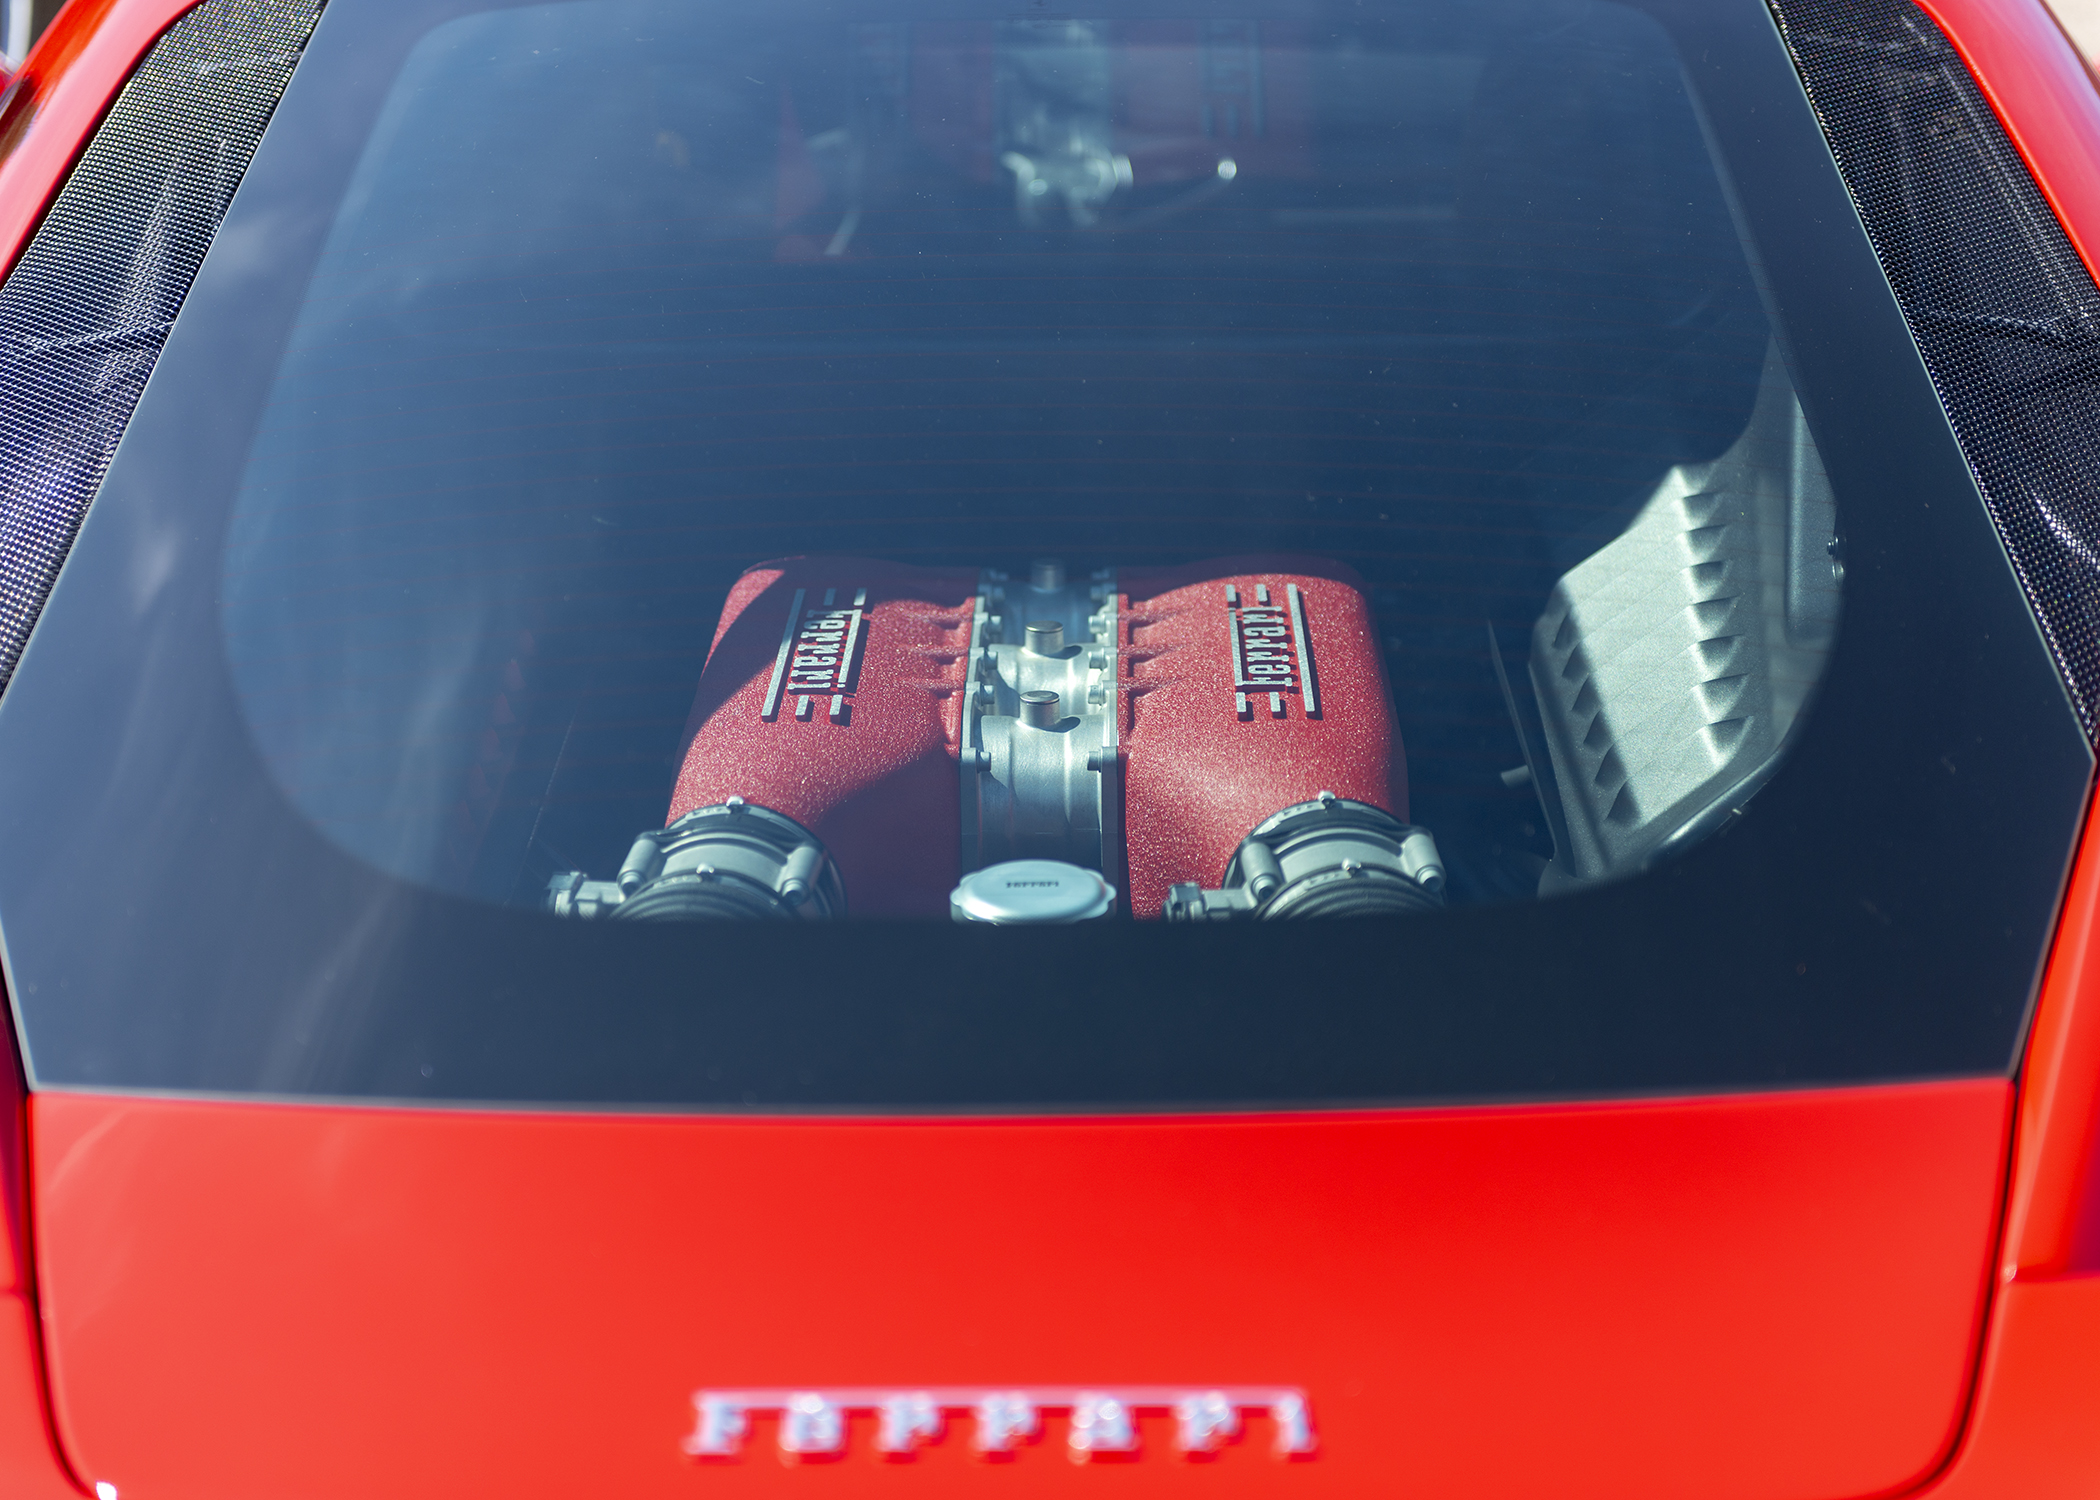 Ferrari 458 Engine. 4.5 Liter Flat-Plane V8. 597 Horsepower. Max Engine Speed - 9000rpm!